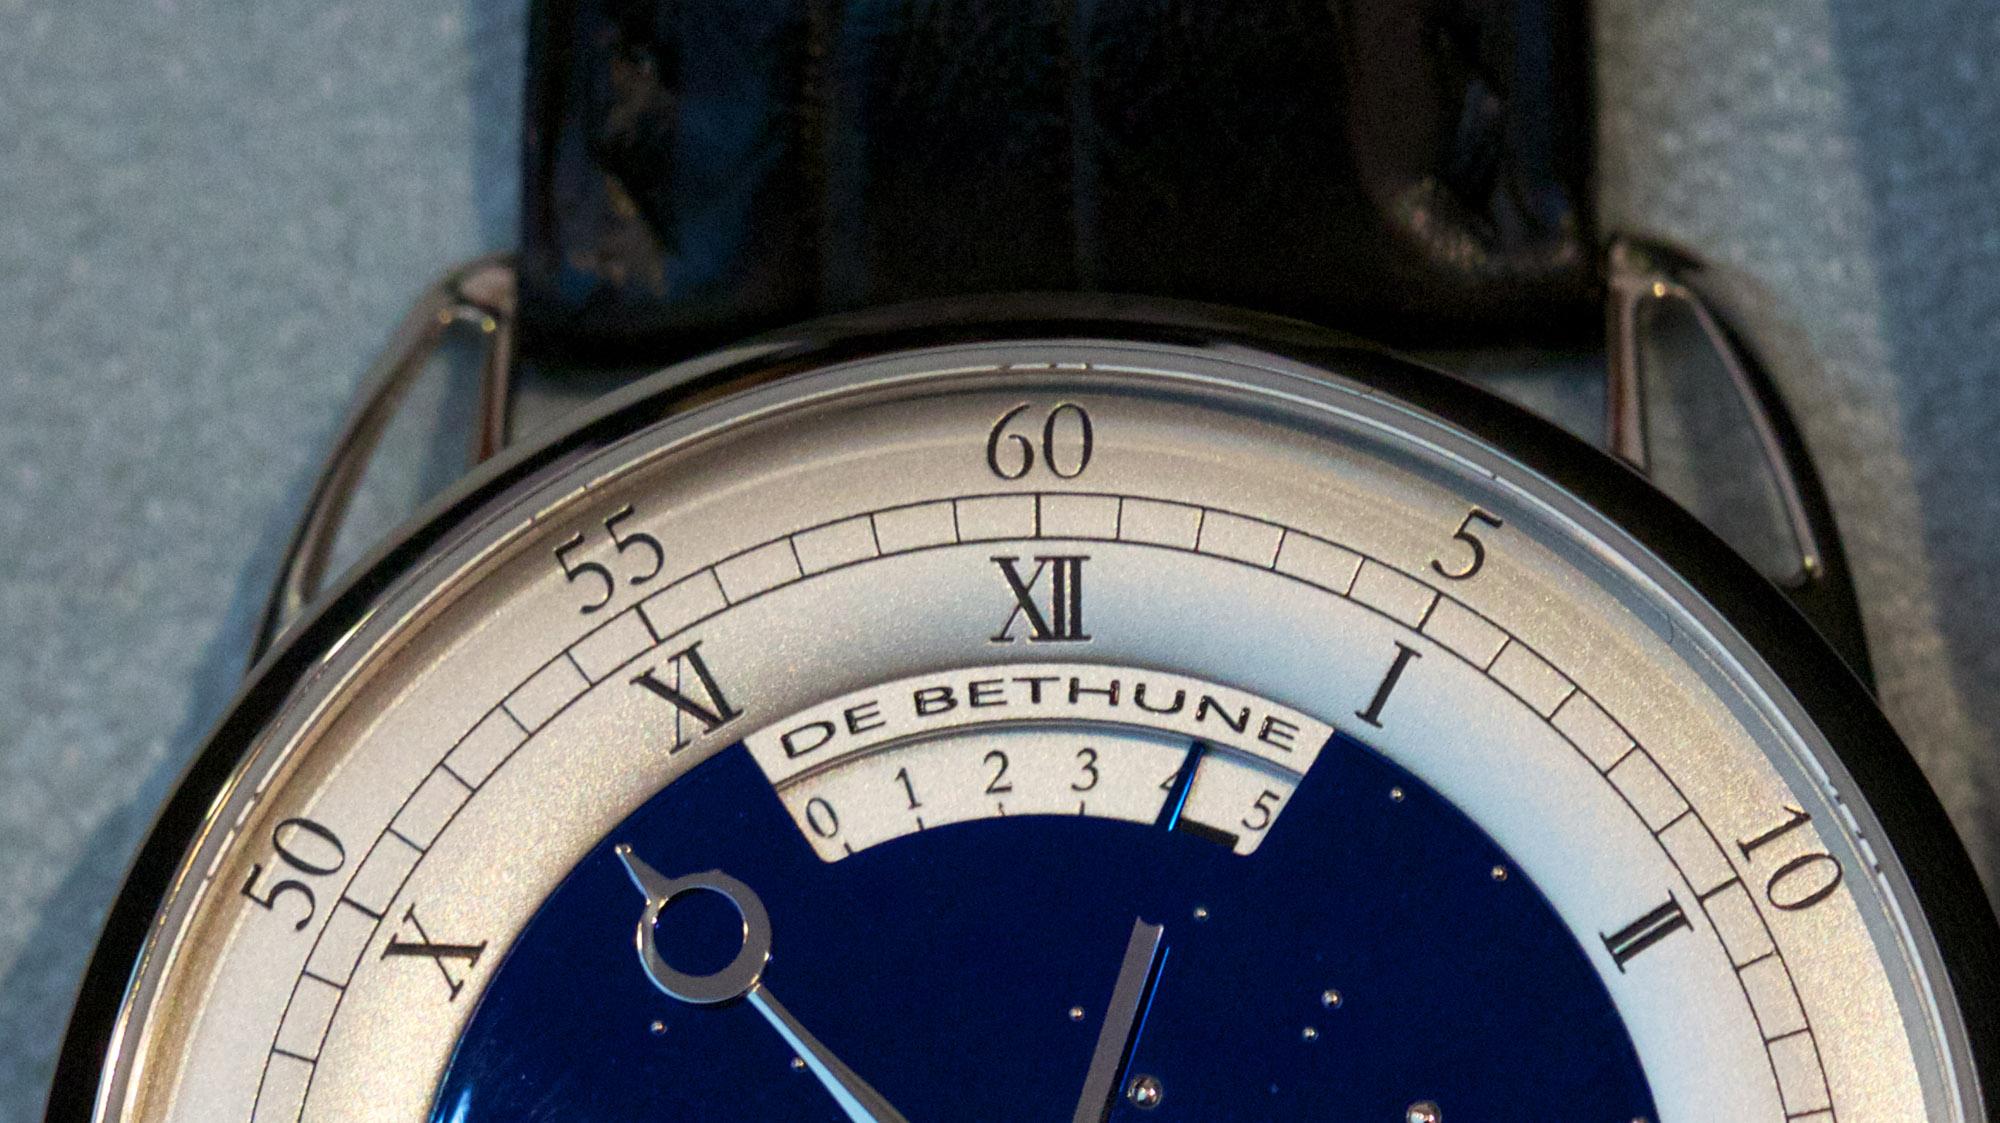 De Bethune DB25T Tourbillon Regulator - Dial